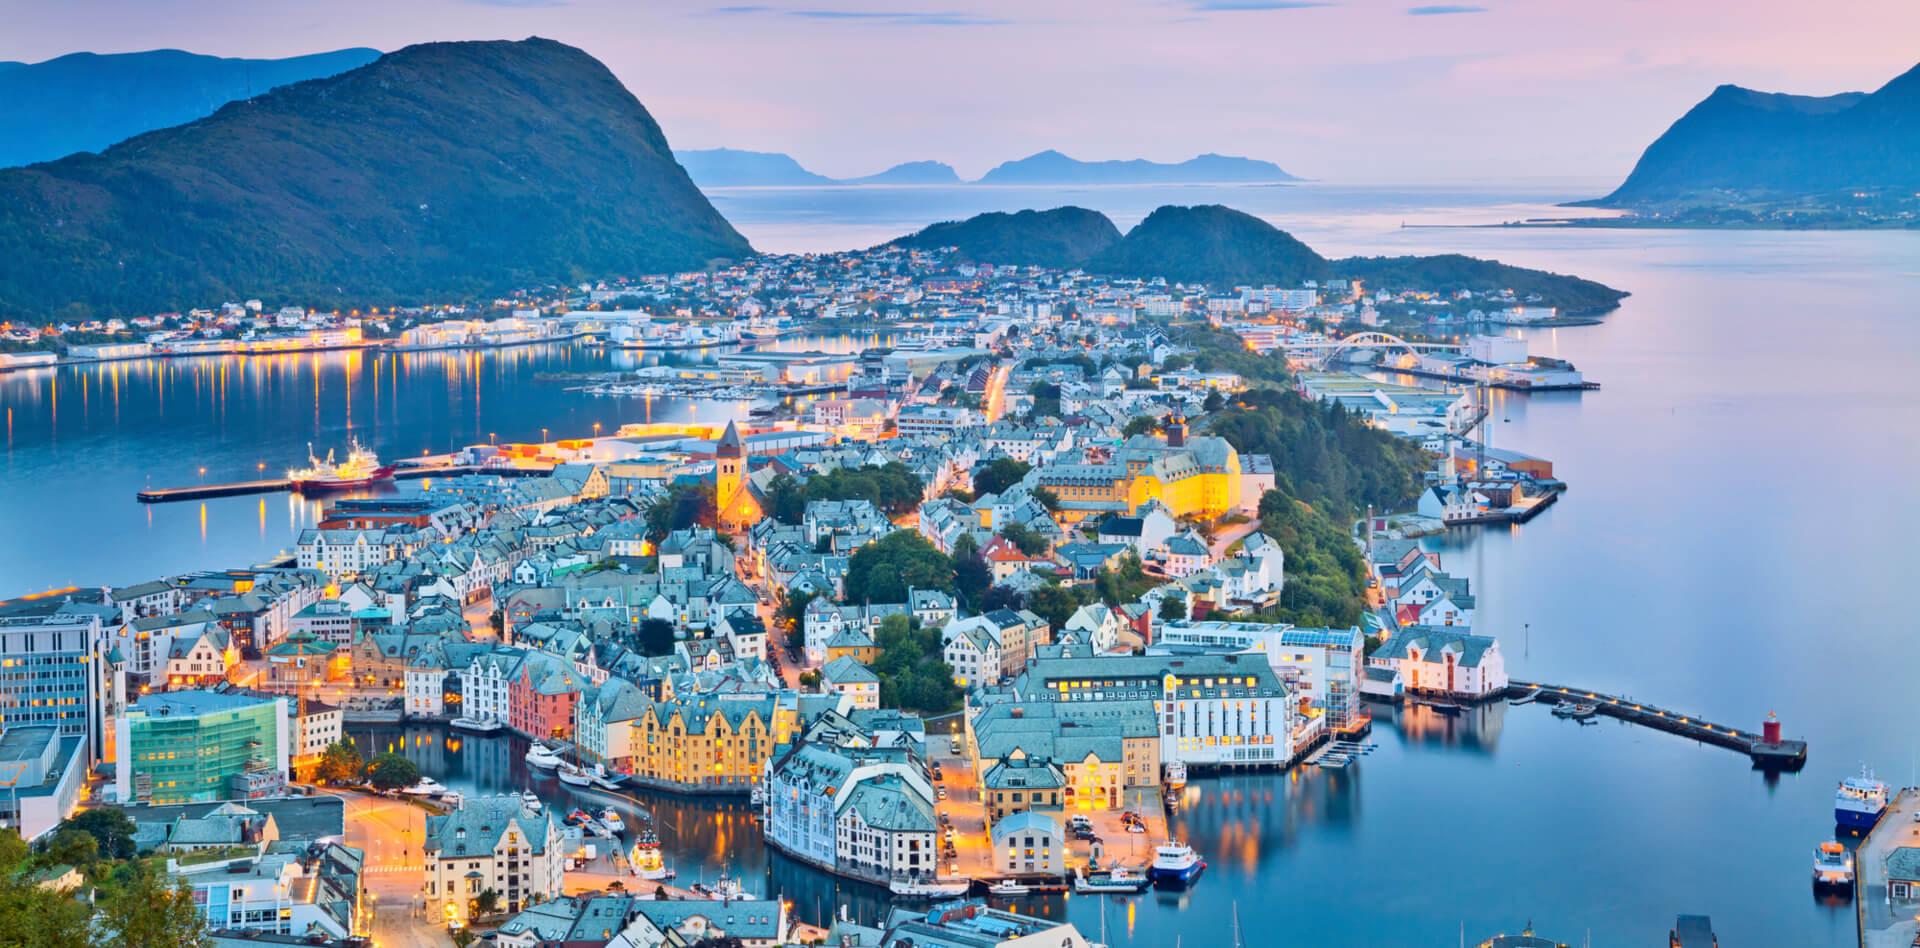 Private trip to Oslo, Flam, Balestrand, Geiranger, Alesund, Bergen in Norway